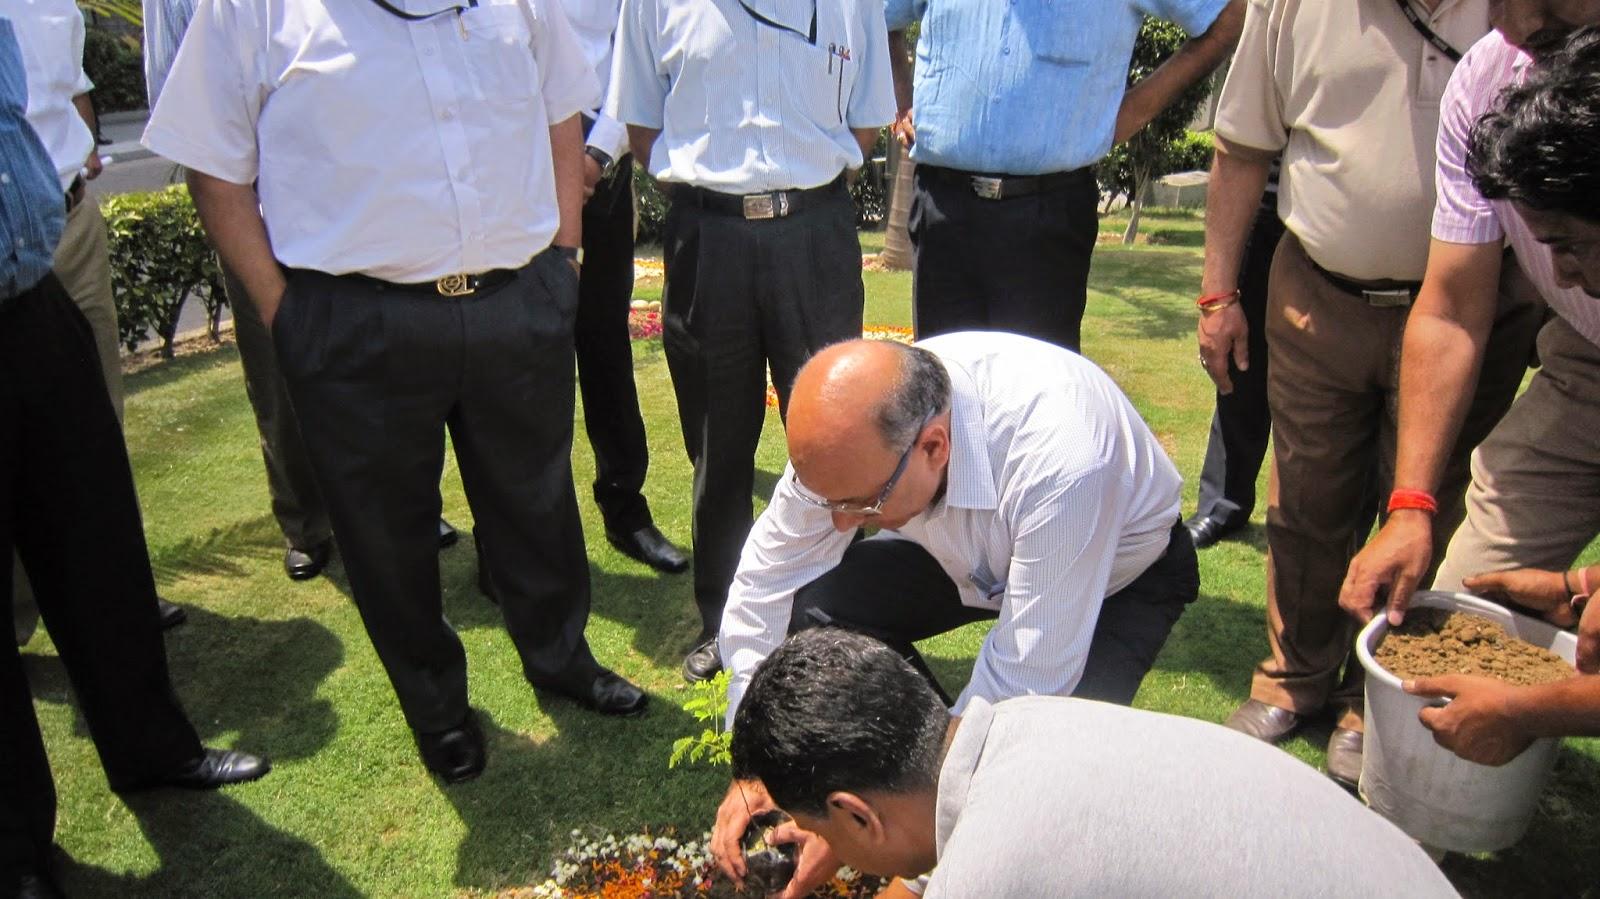 Mr Mangu SIngh Delhi Metro planting a sandalwood trees